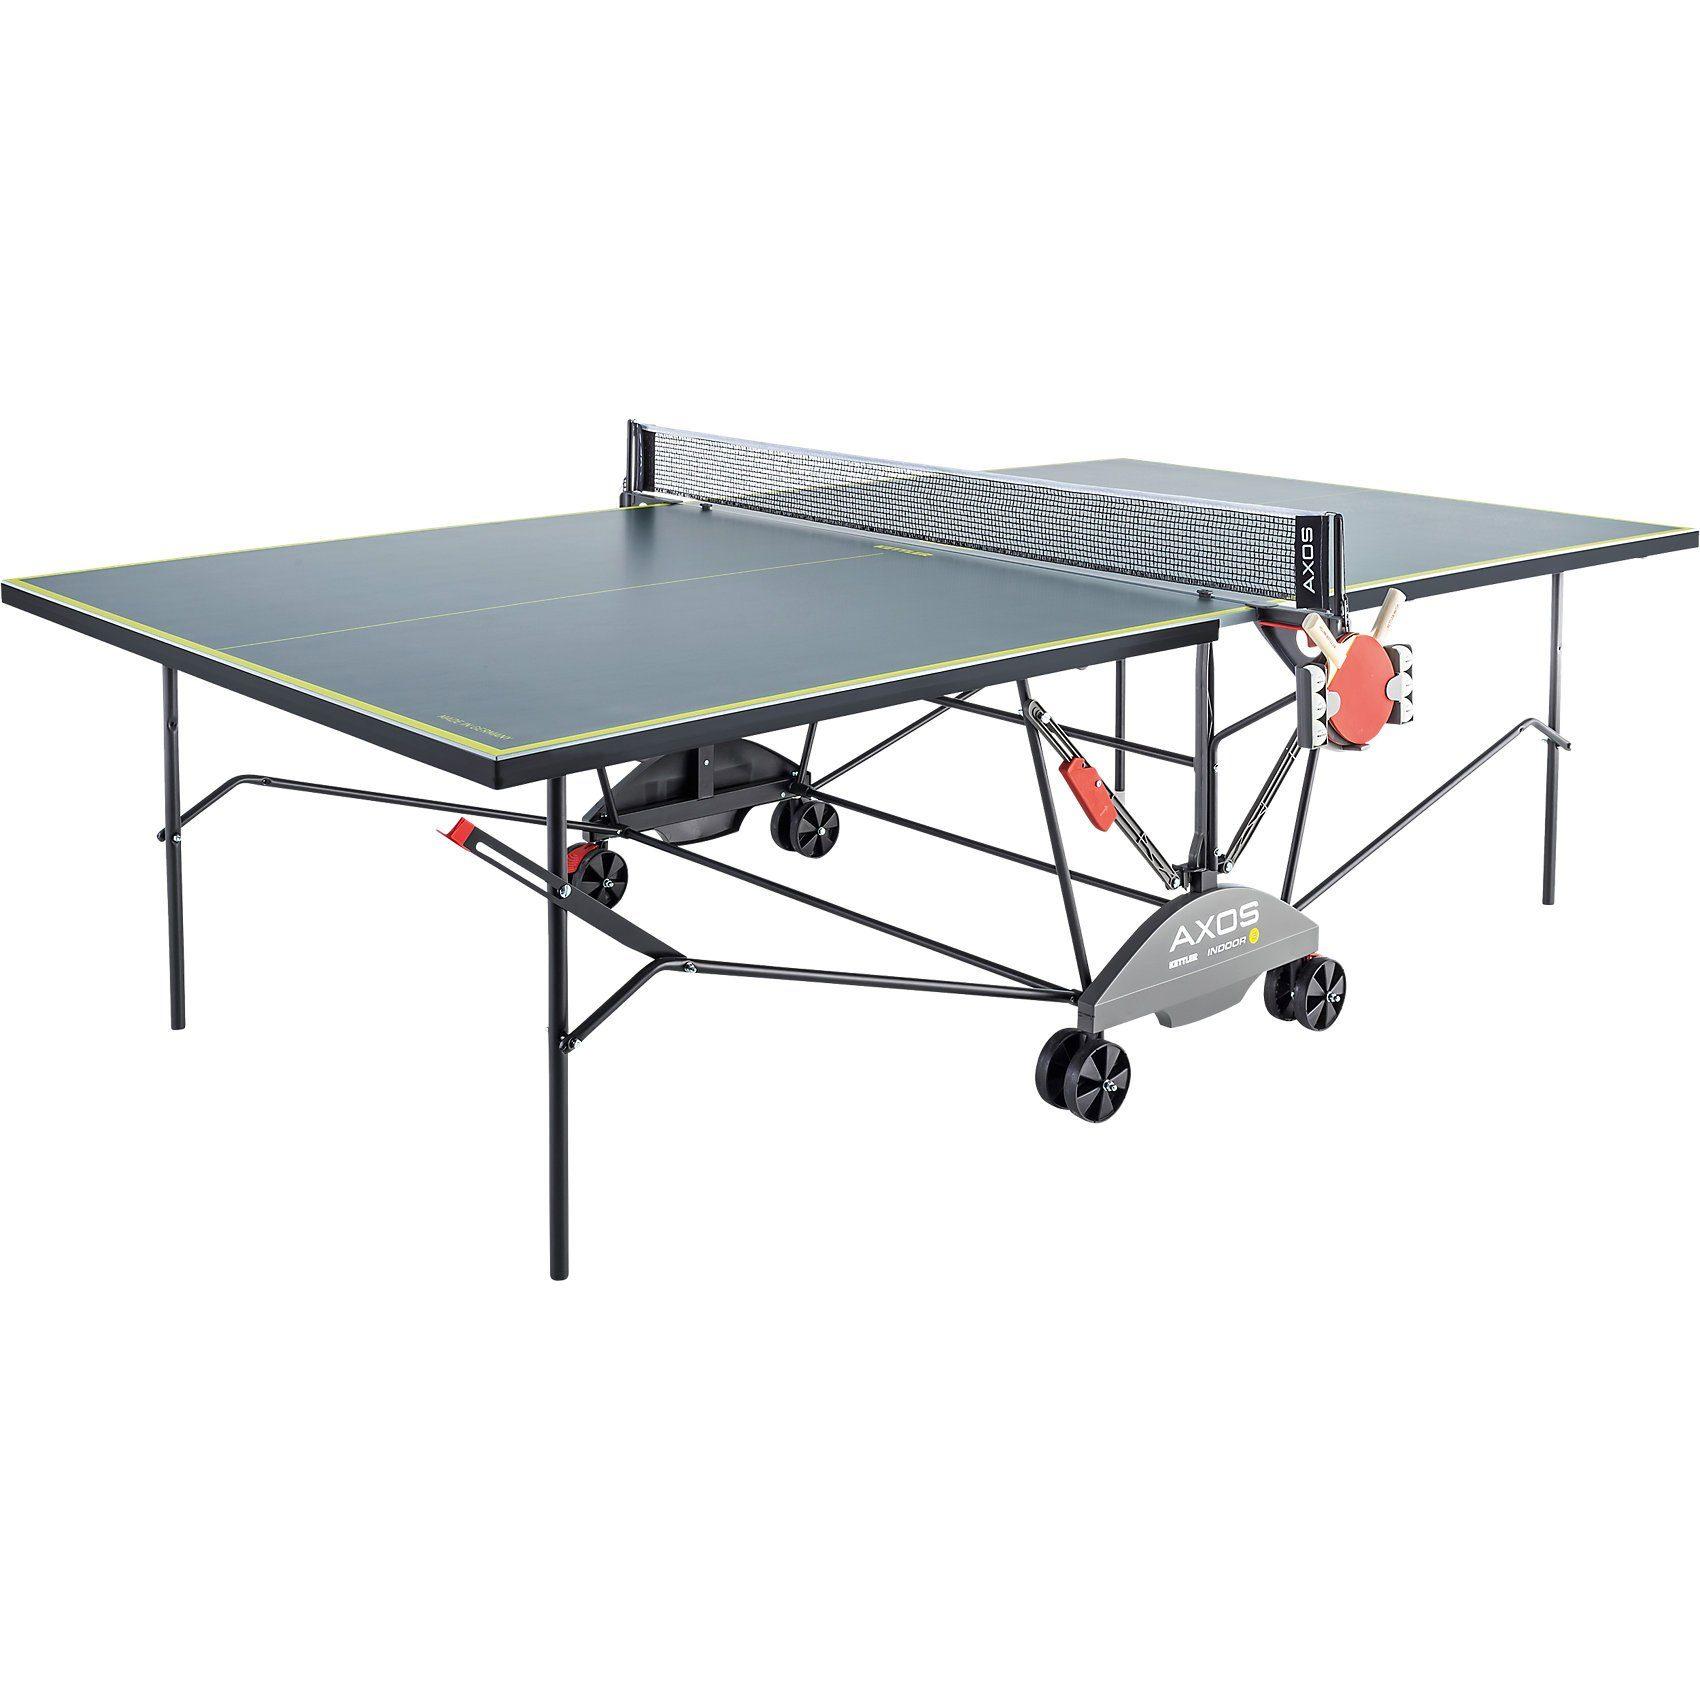 Kettler TT-Tisch AXOS Indoor 3